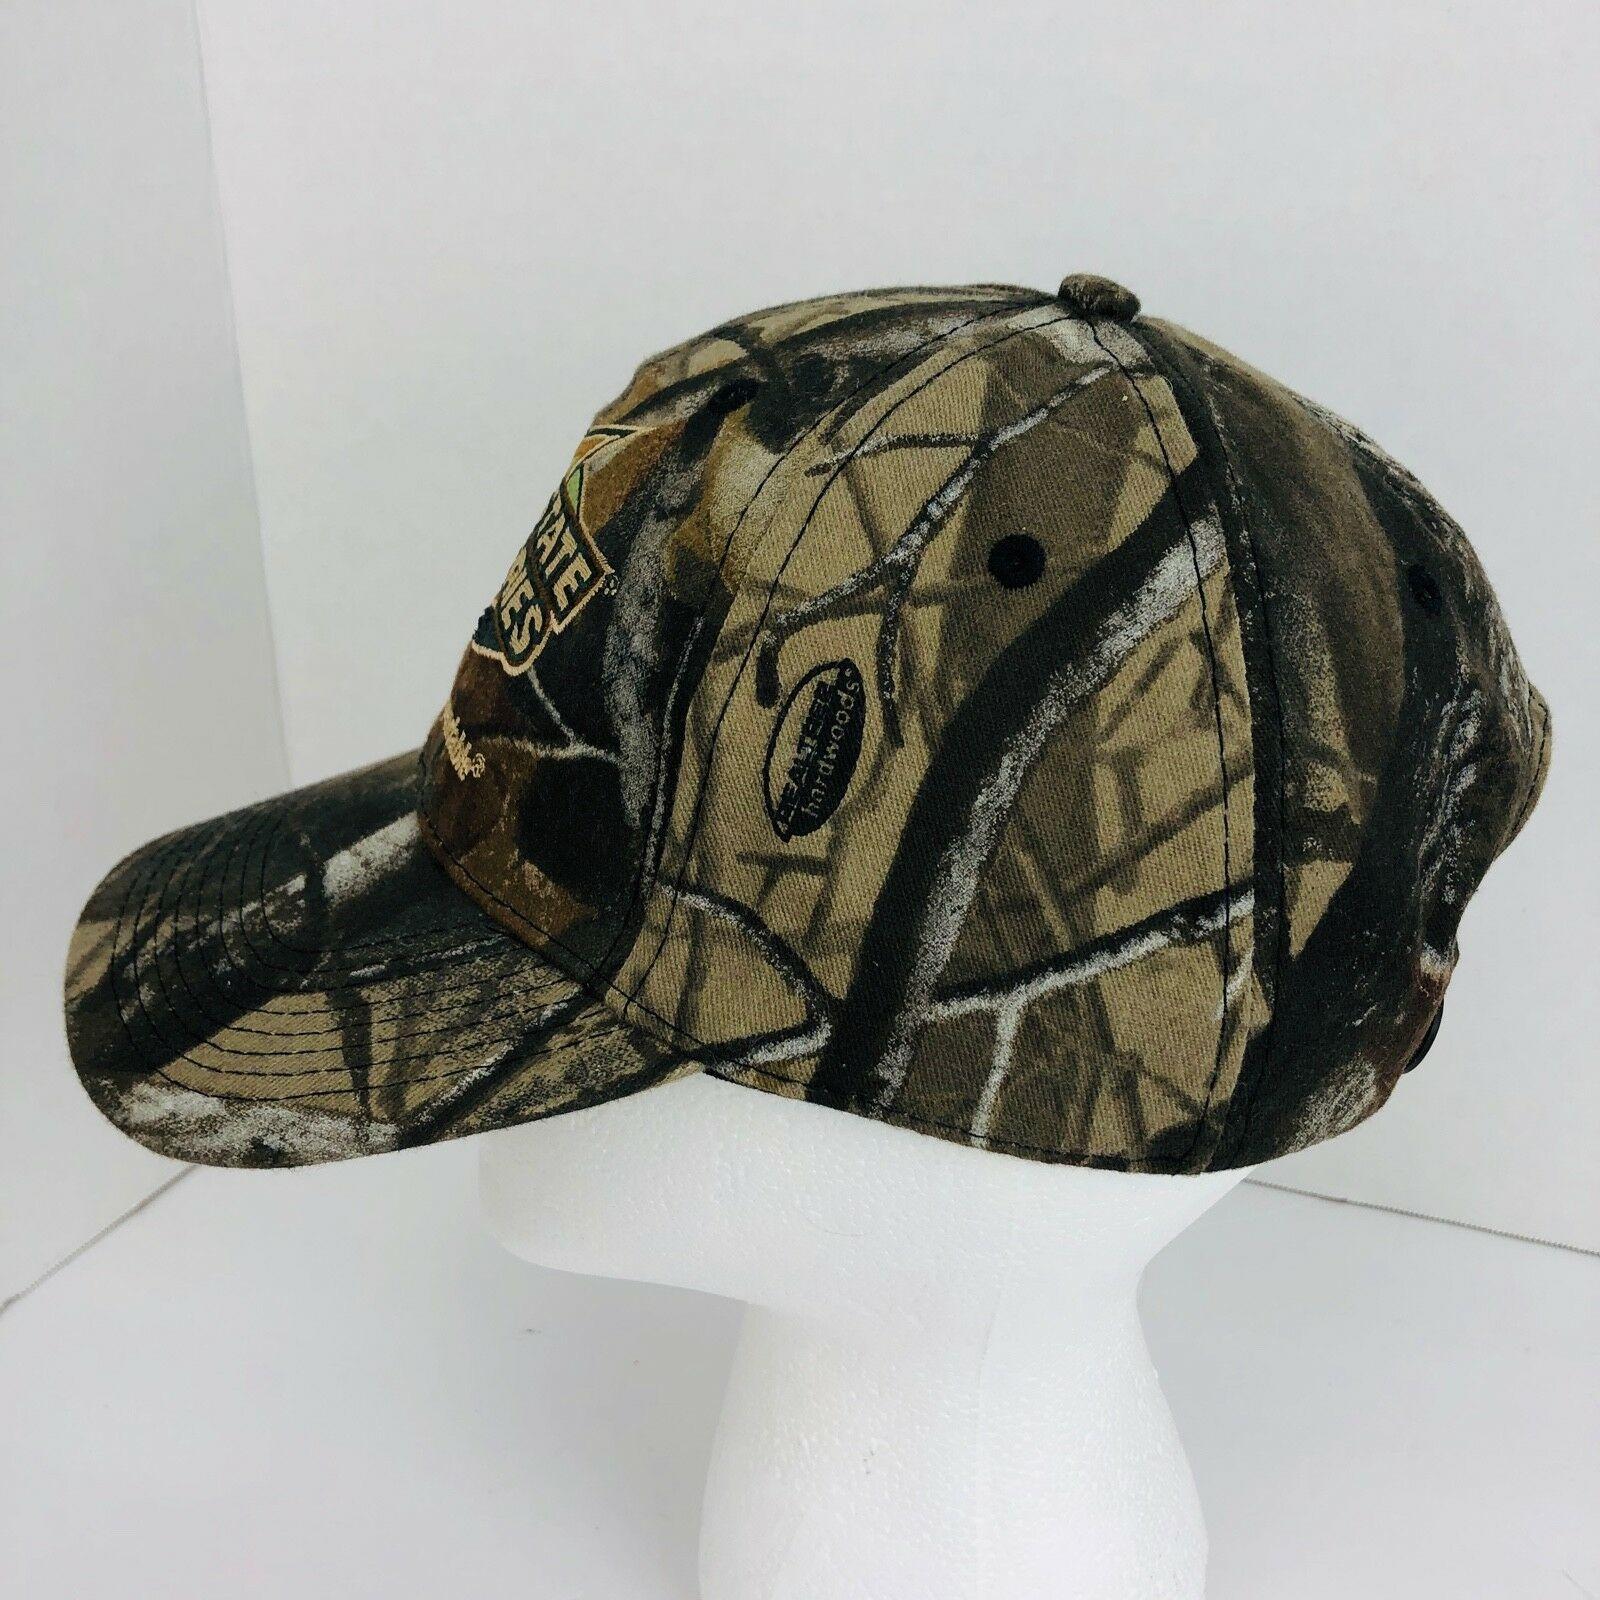 Interstate Batteries Camo Camouflage Realtree Snapback Cap Hat Baseball